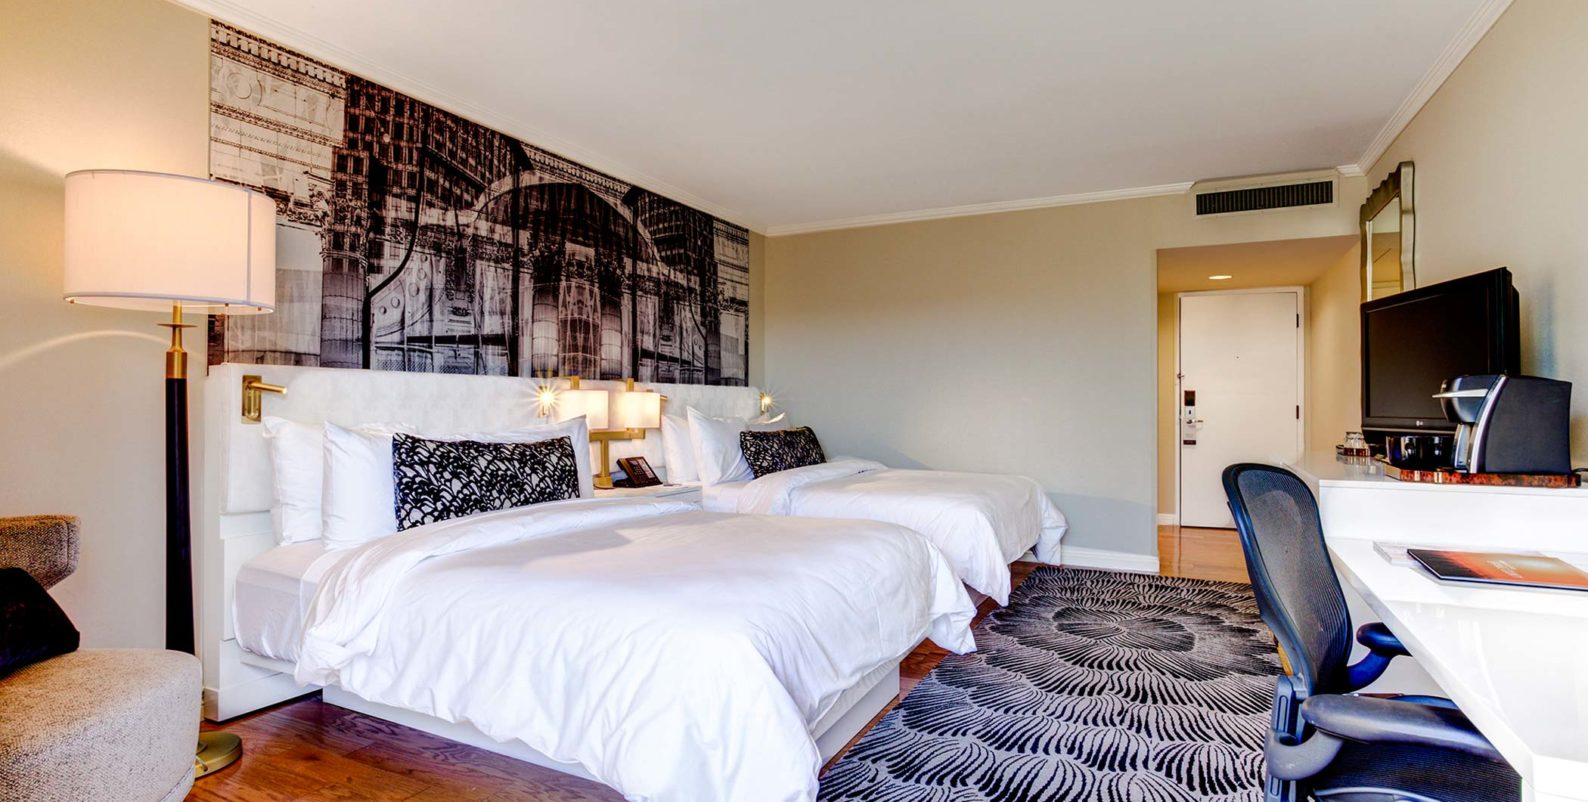 Queen Room at Avenue of the Arts Costa Mesa